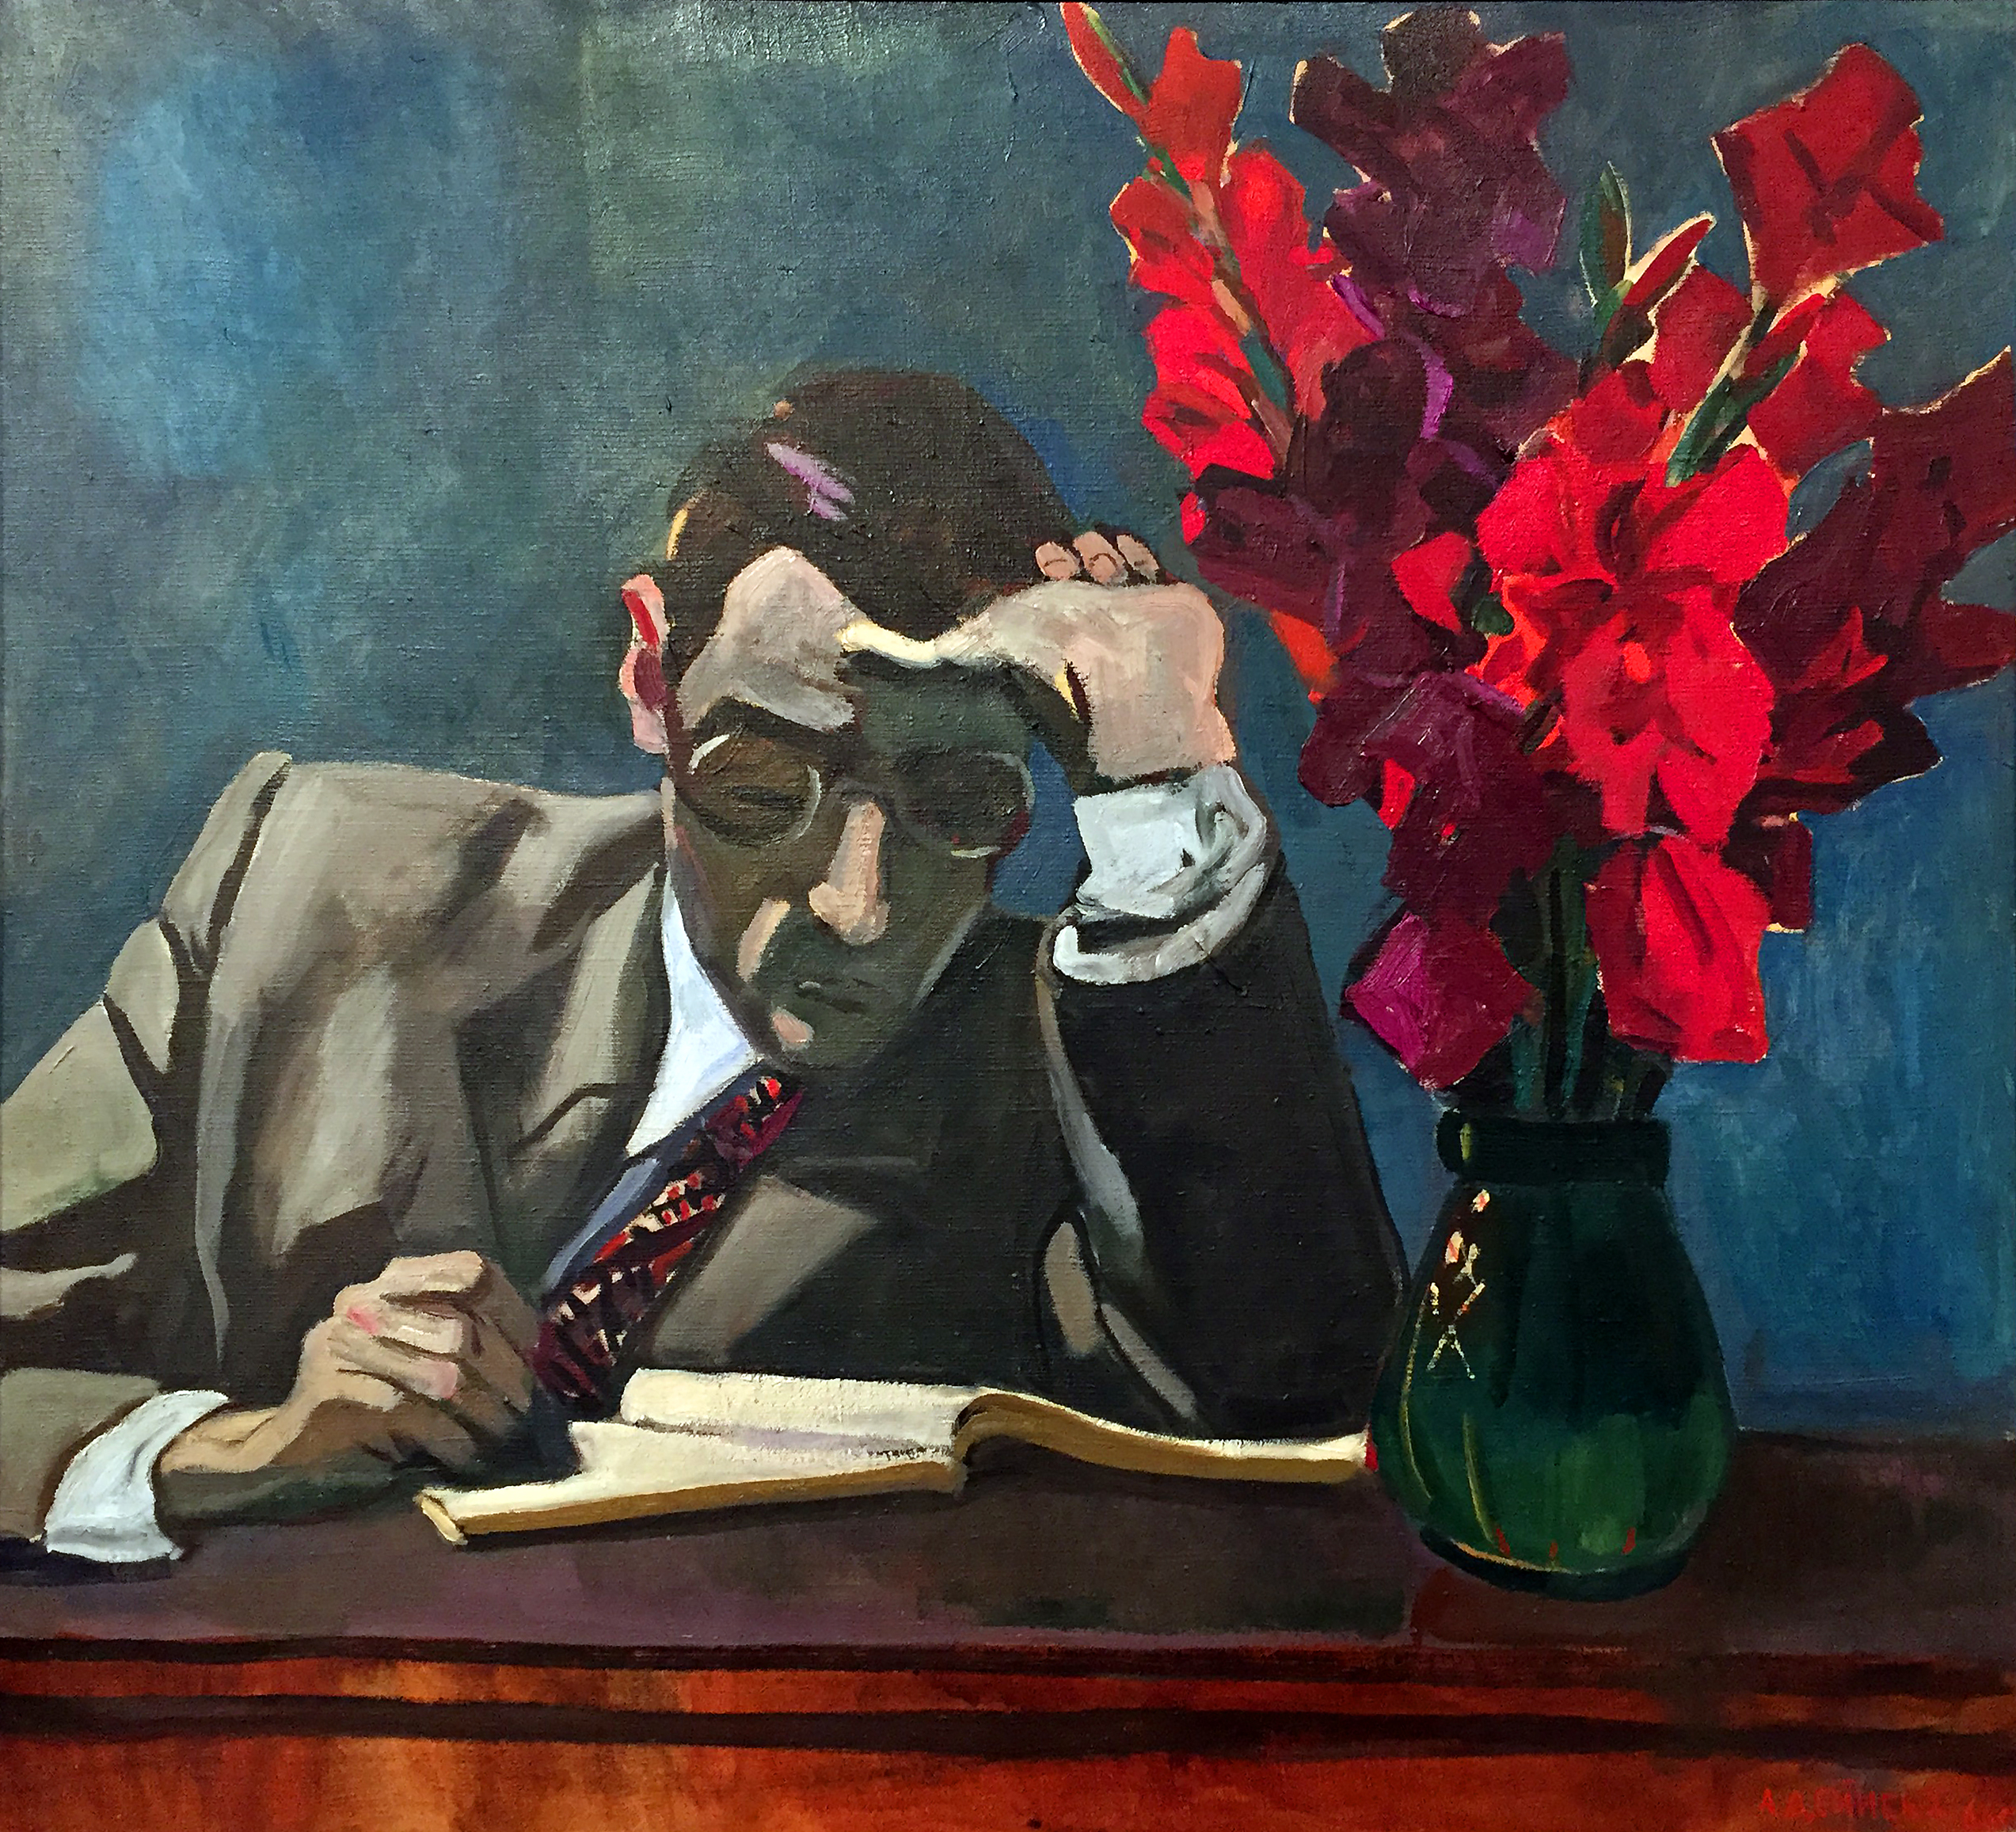 Alexander Deineka - Una decisione difficile - olio su tela (1966).